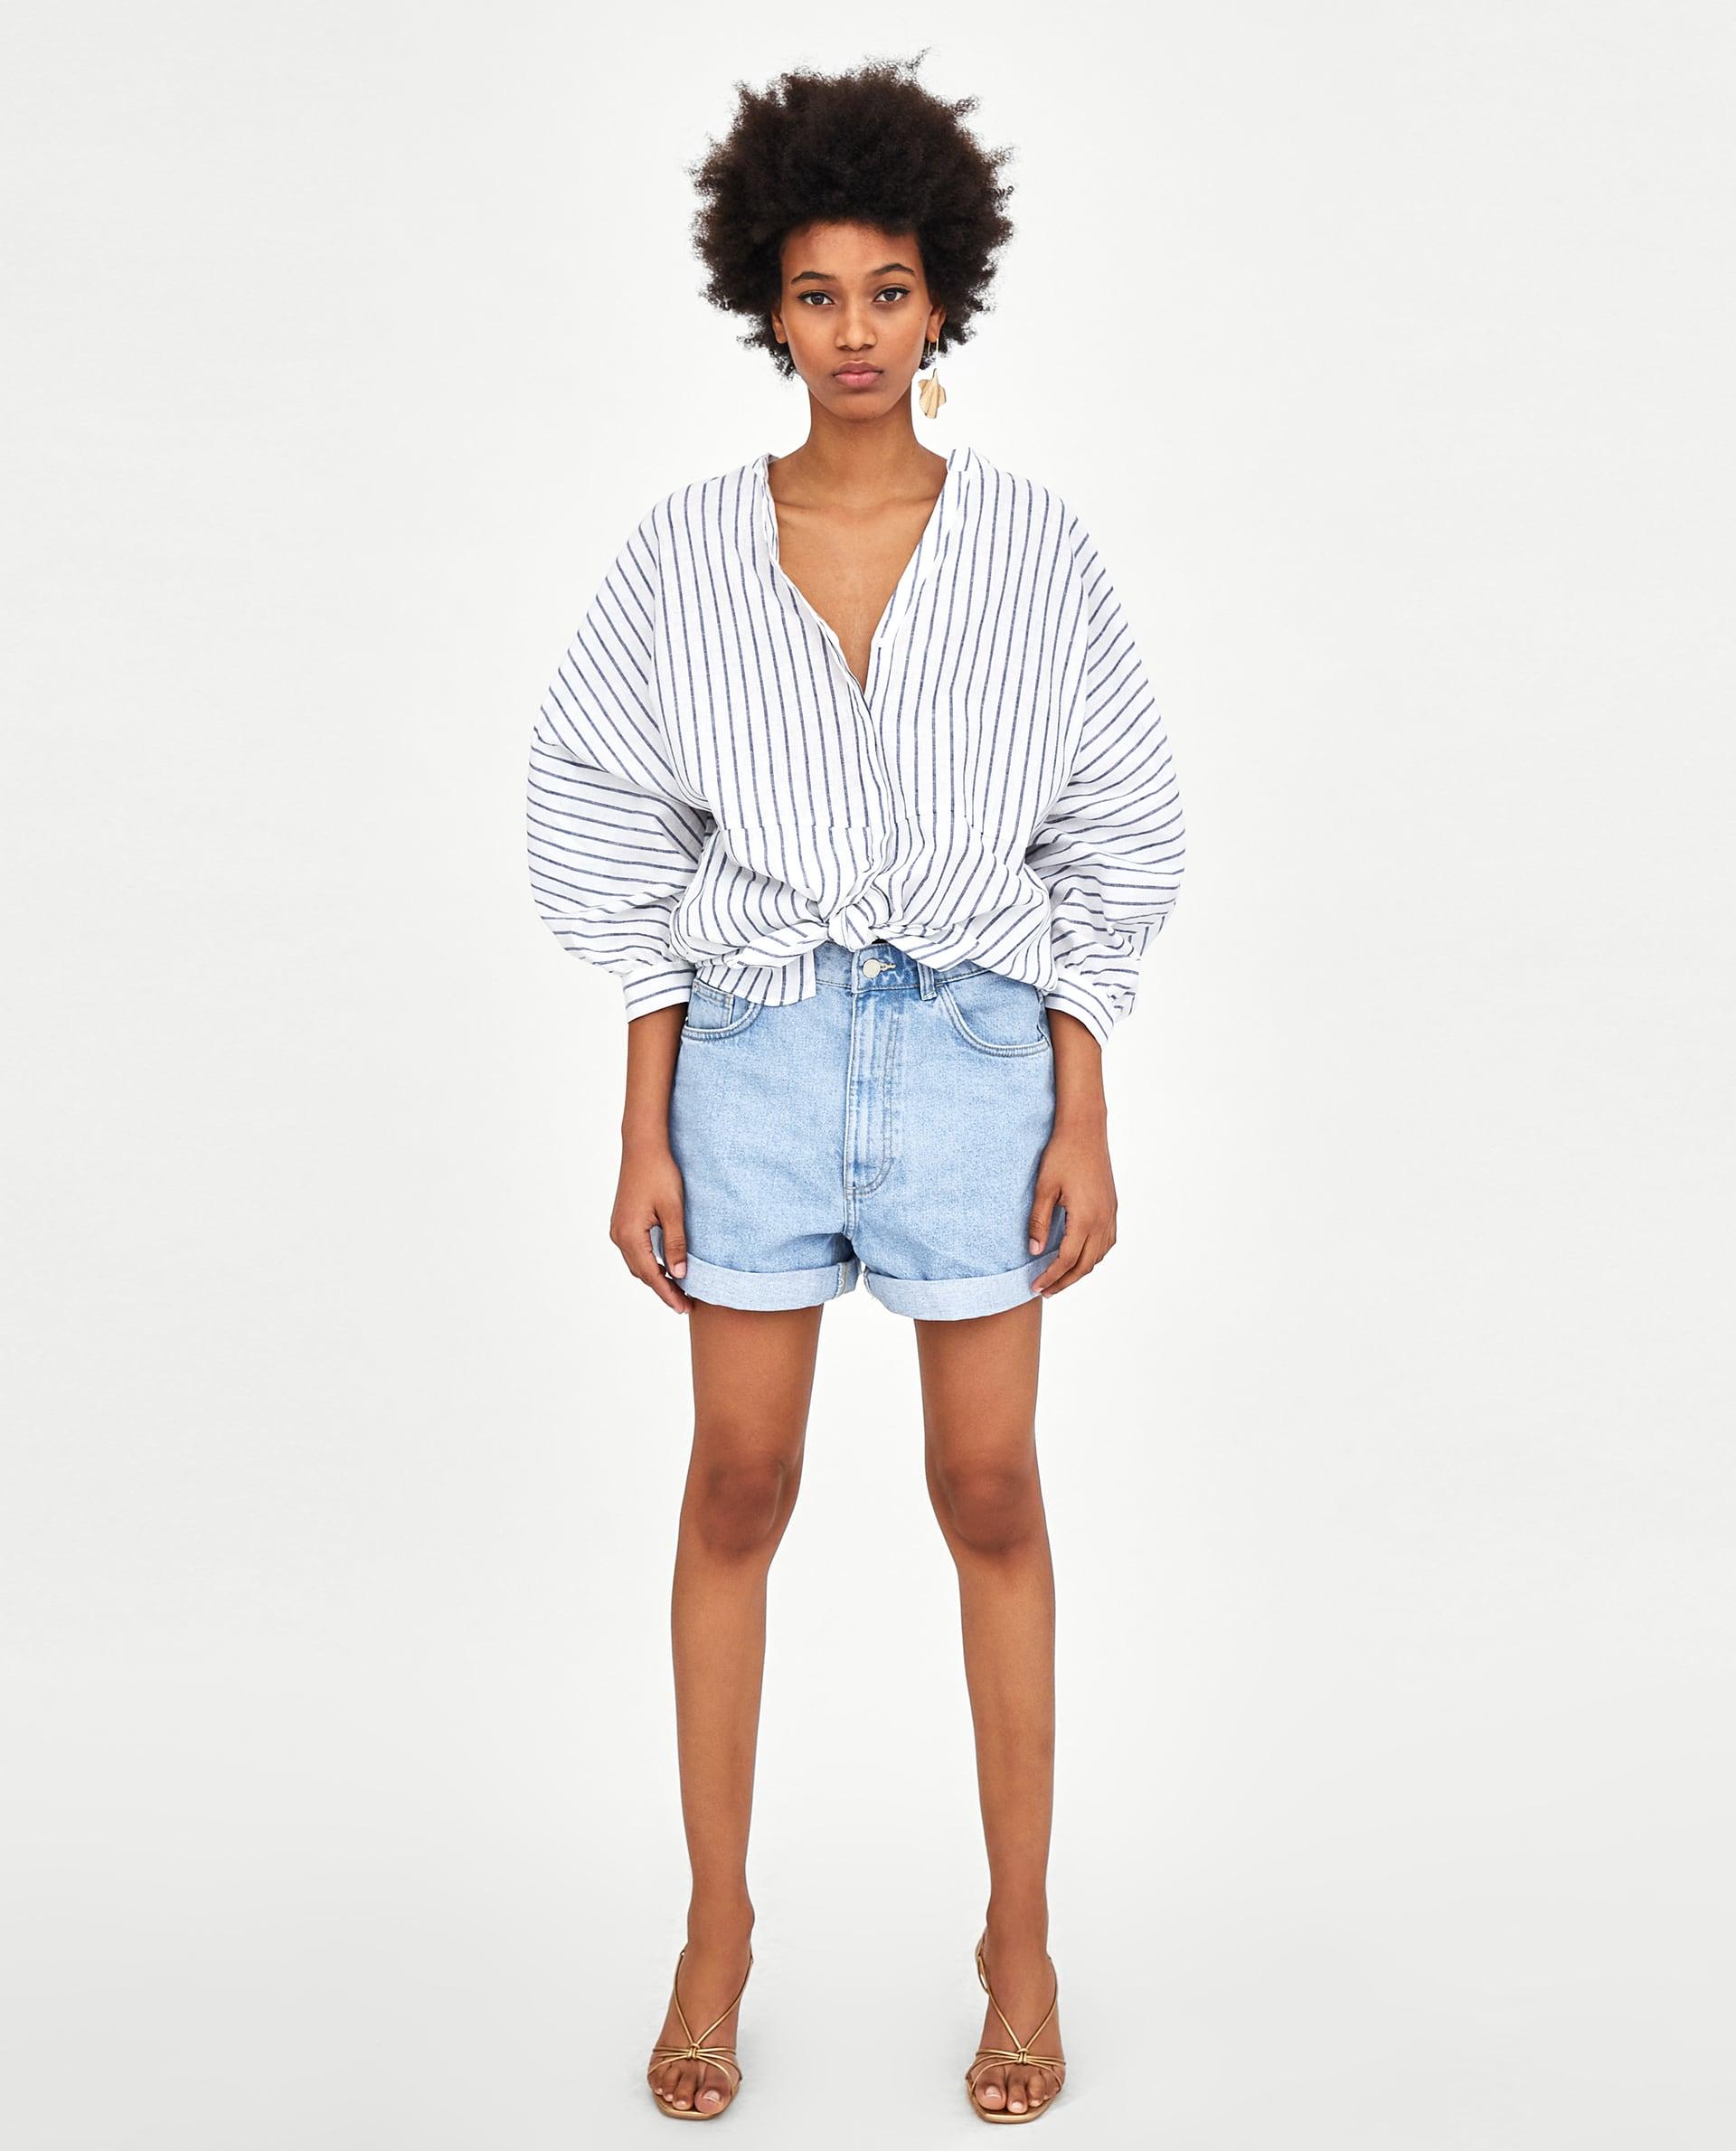 070b6b7e27 Very Goods | MOM - FIT BERMUDA SHORTS-Shorts and skirts-DENIM-WOMAN | ZARA  United States